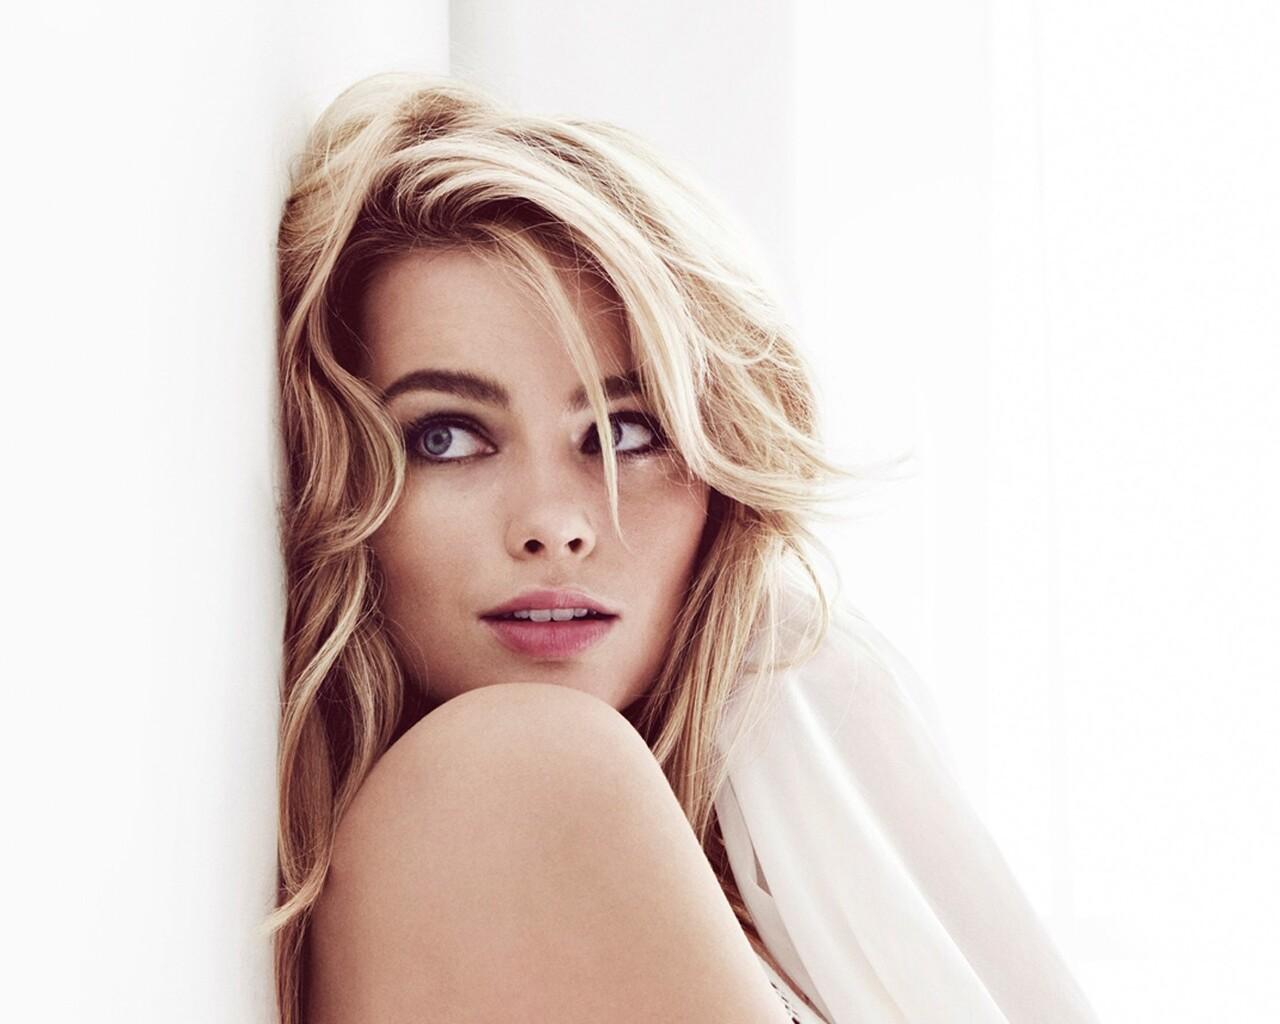 HD Margot Robbie, HD Celebrities, 4k Wallpapers, Images